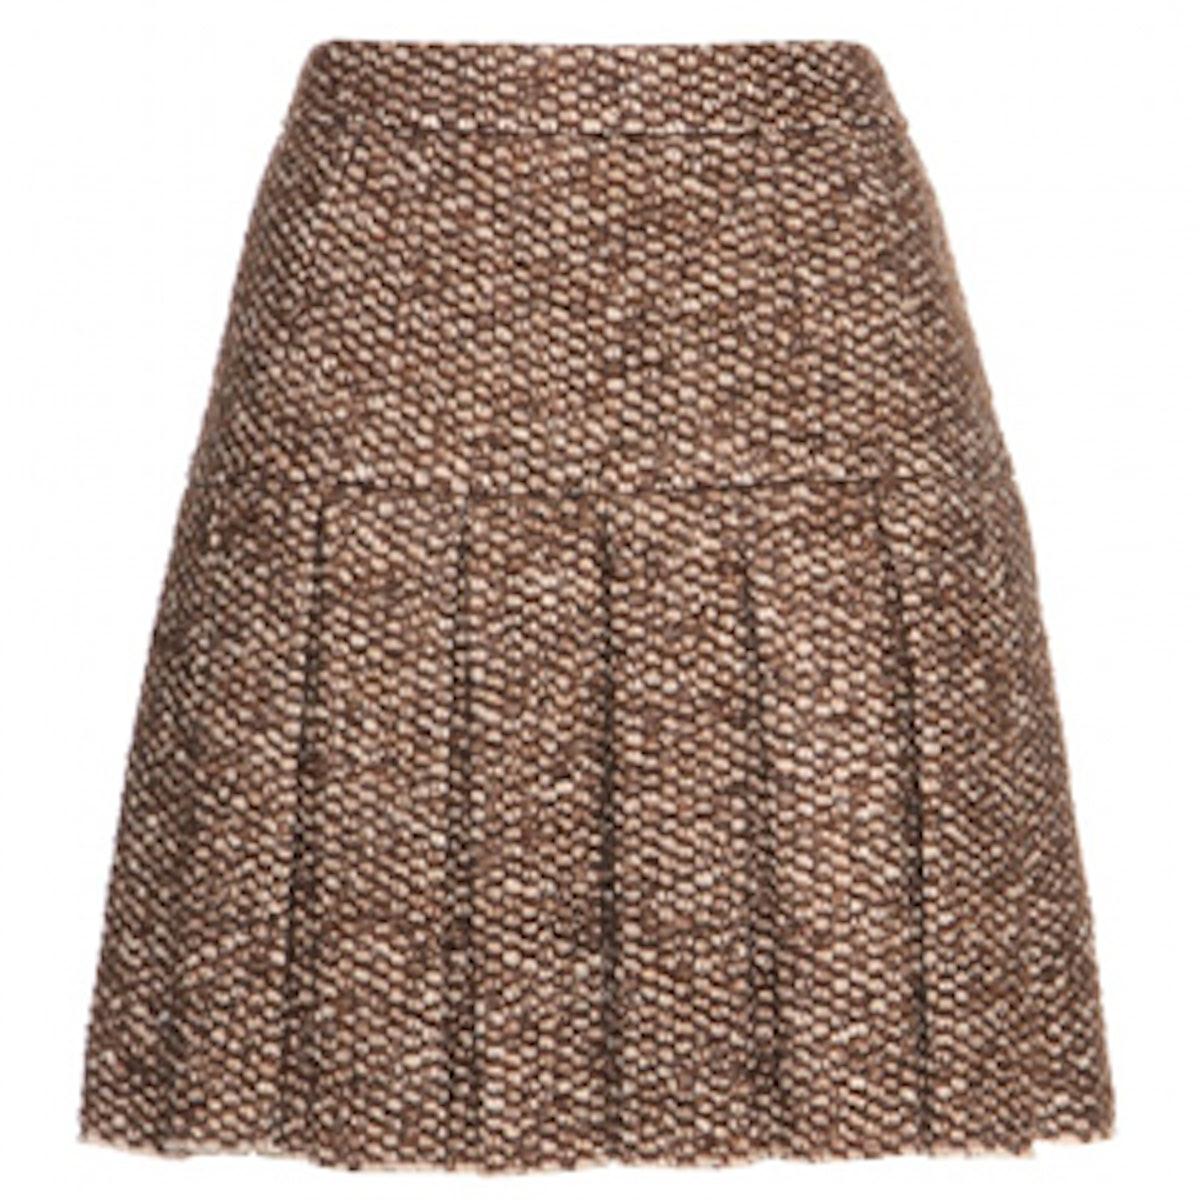 Tweed-Effect Knit Skirt